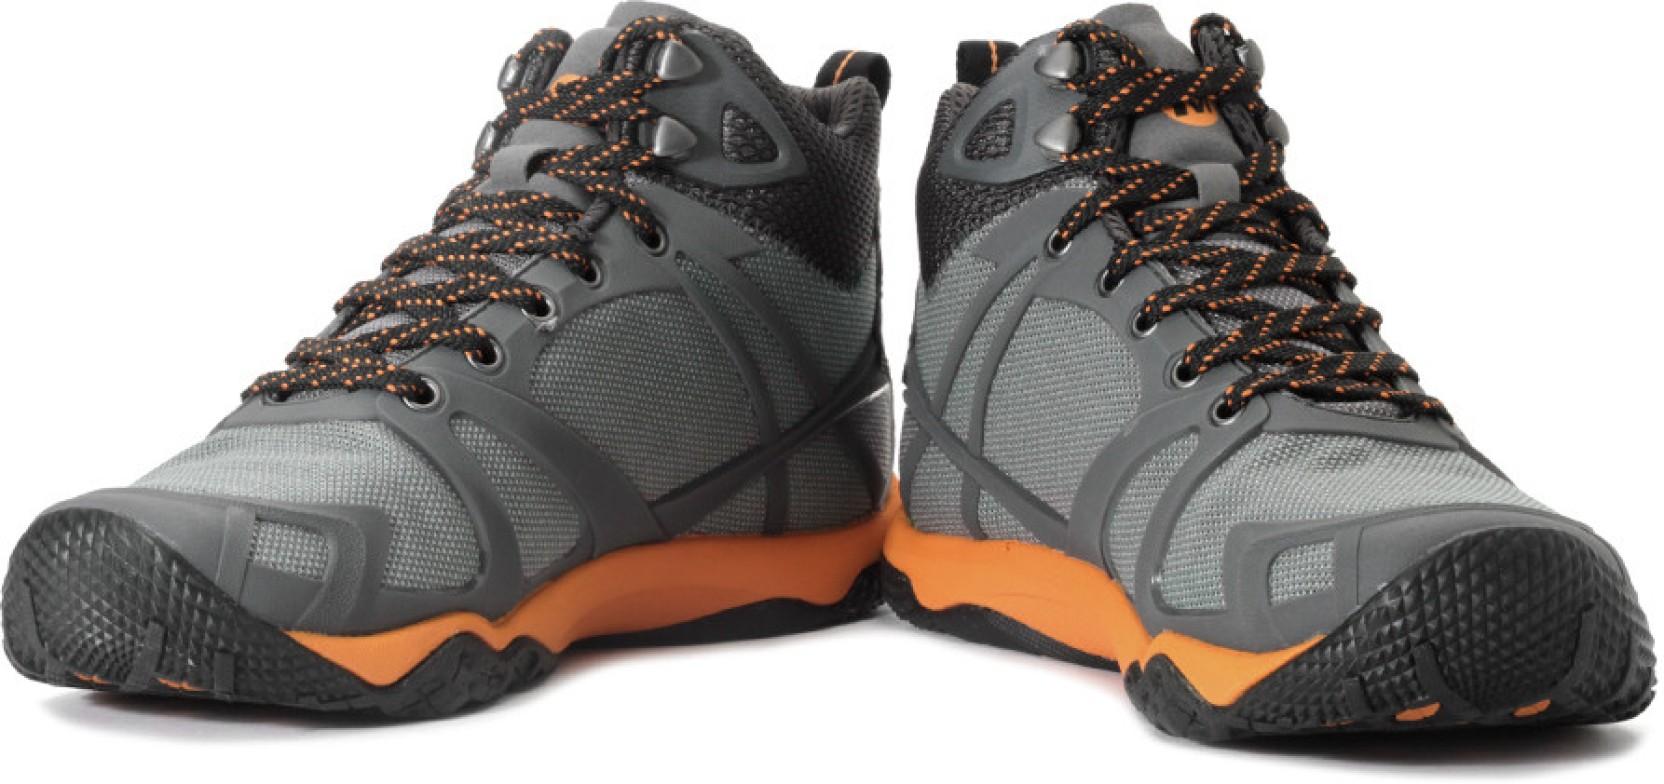 0a63f2fae11d Merrell Proterra Mid Sport Gore-Tex Hiking   Trekking Shoes For Men  (Orange